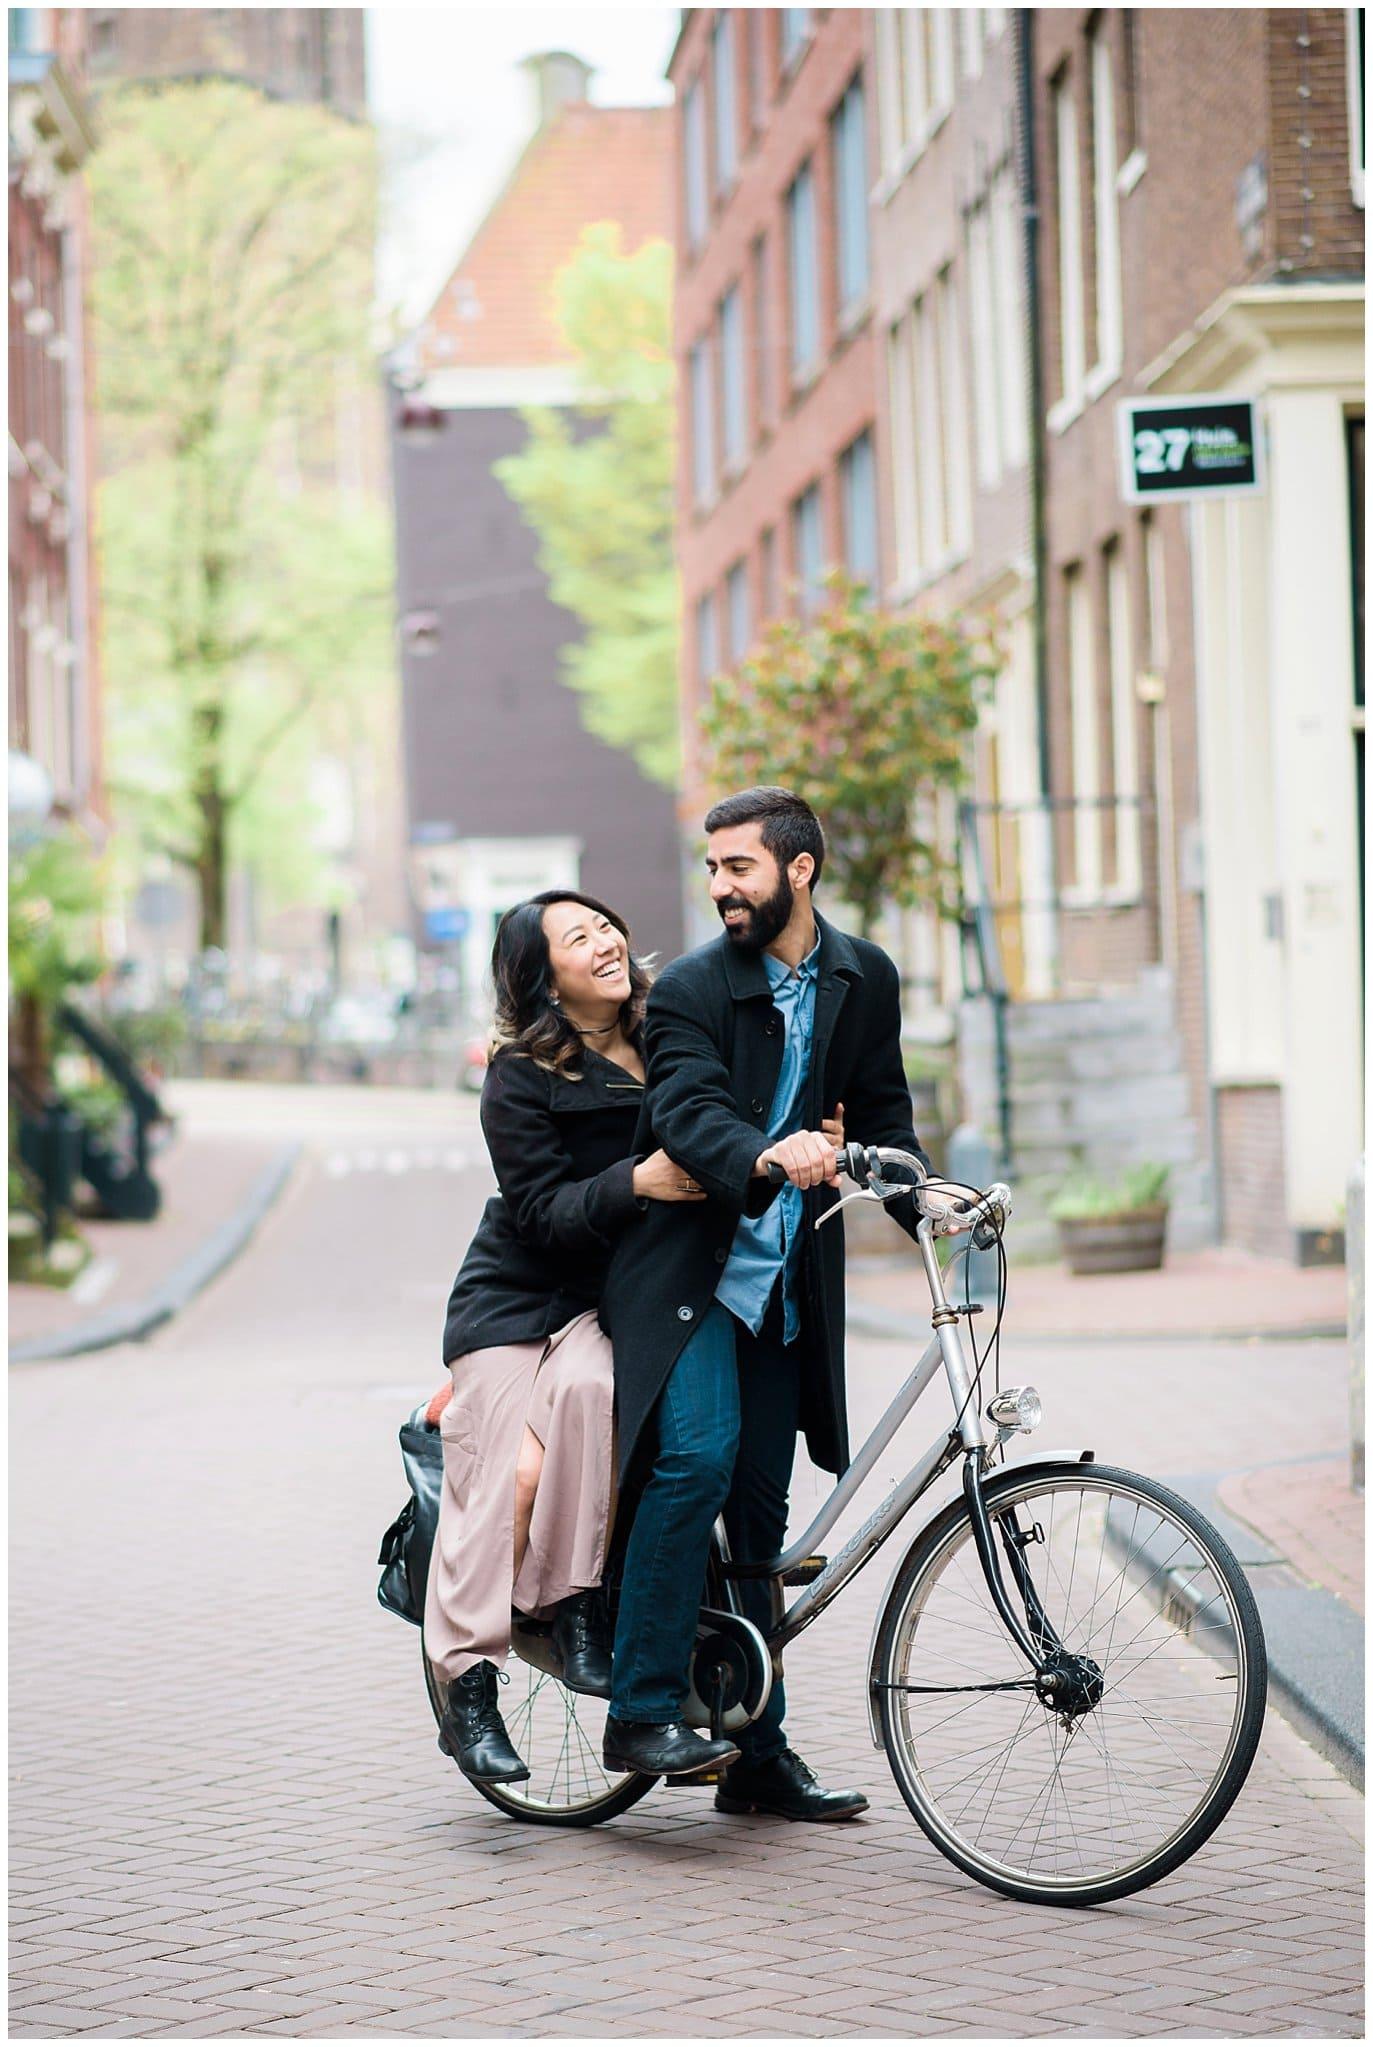 Amsterdam bike engagement session photo